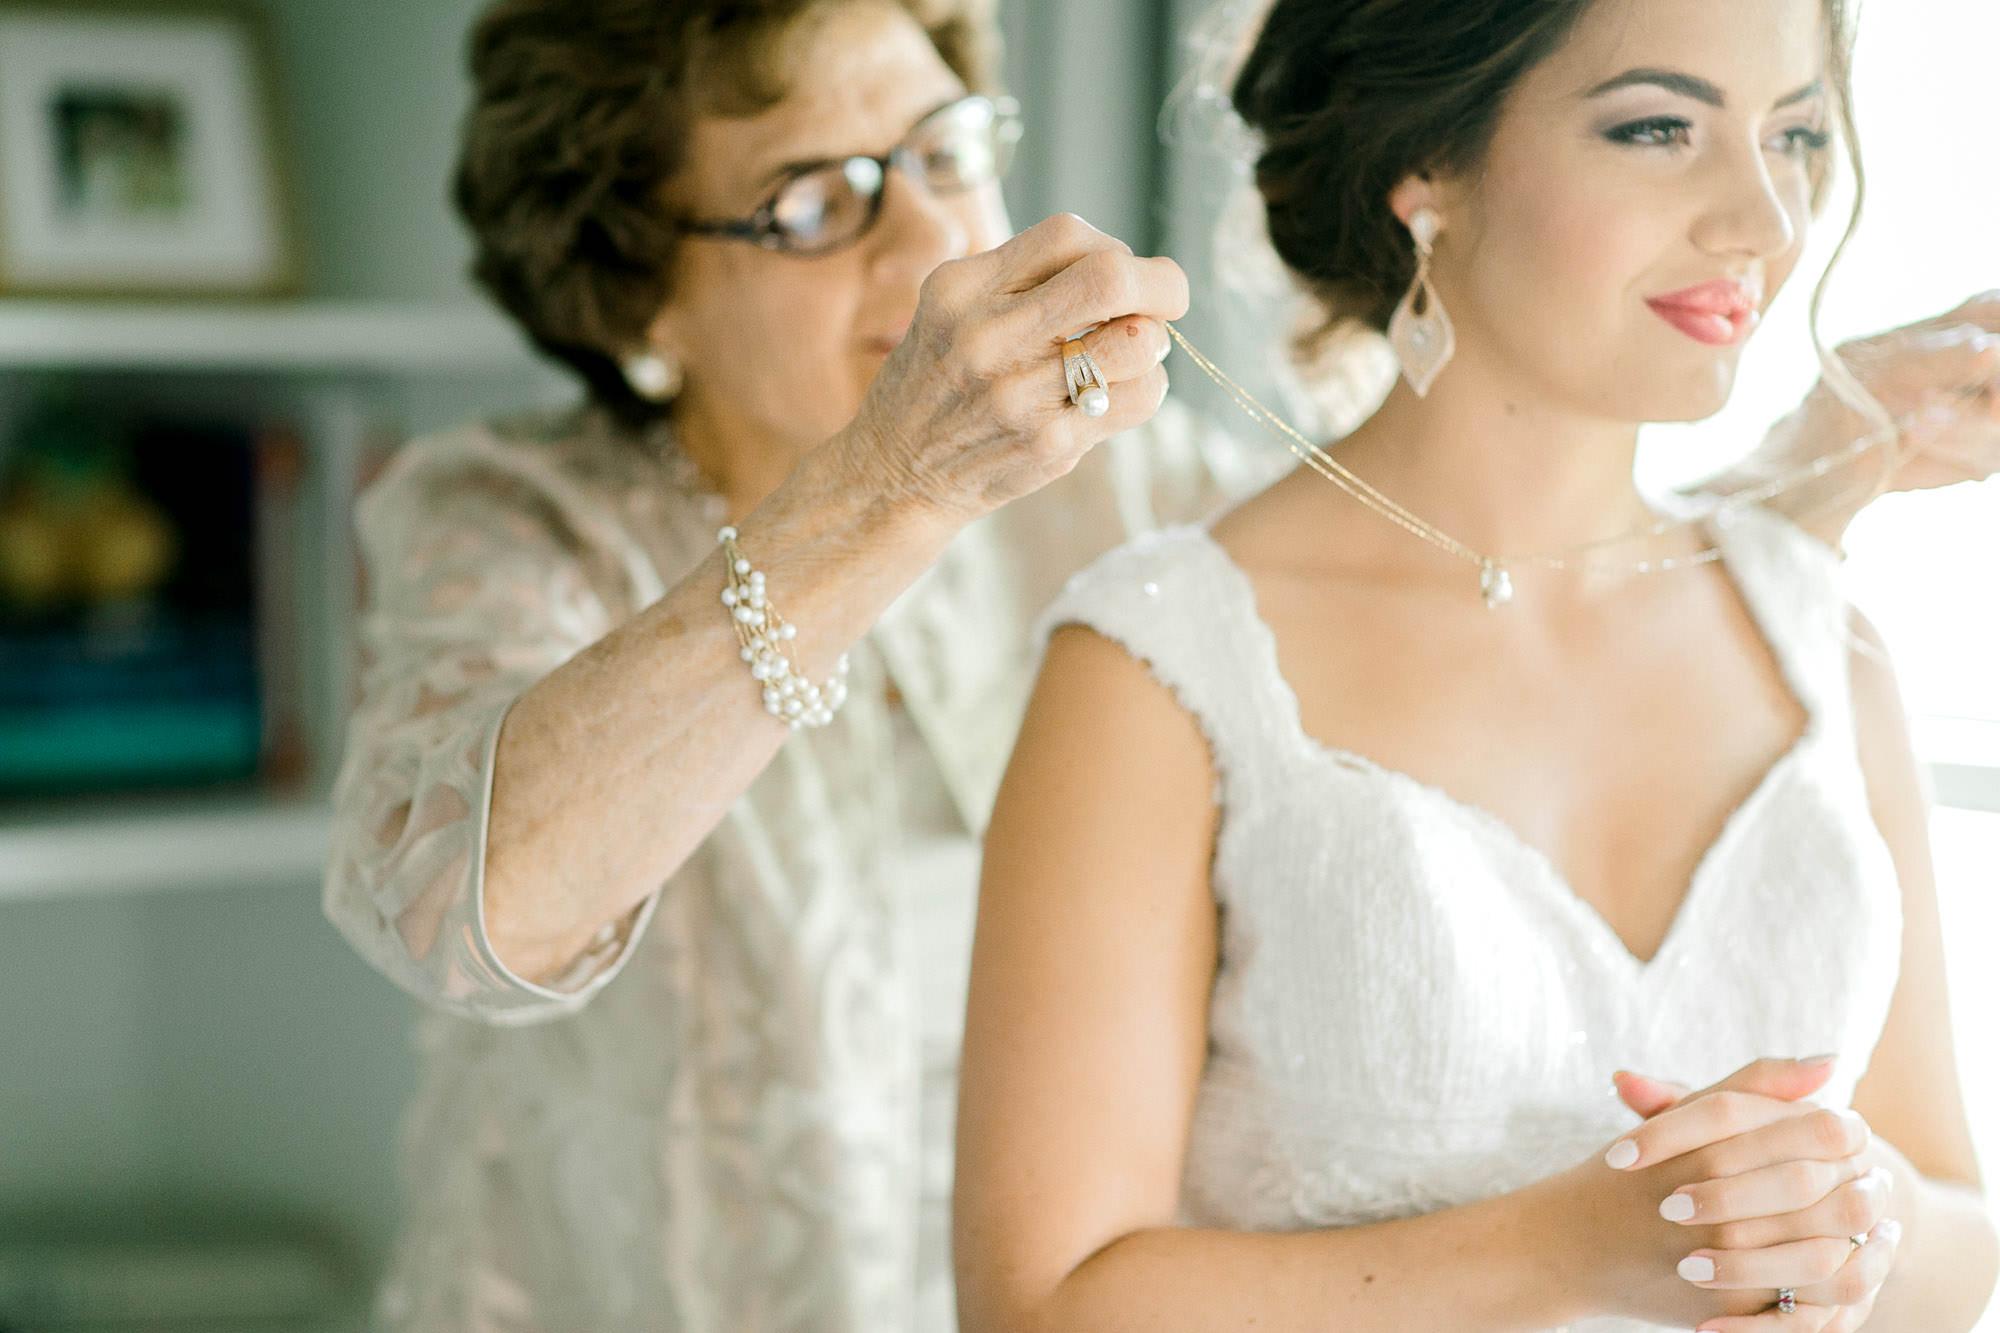 alexis-joel-laury-lubbock-weddingphotographer-alleej0006.jpg